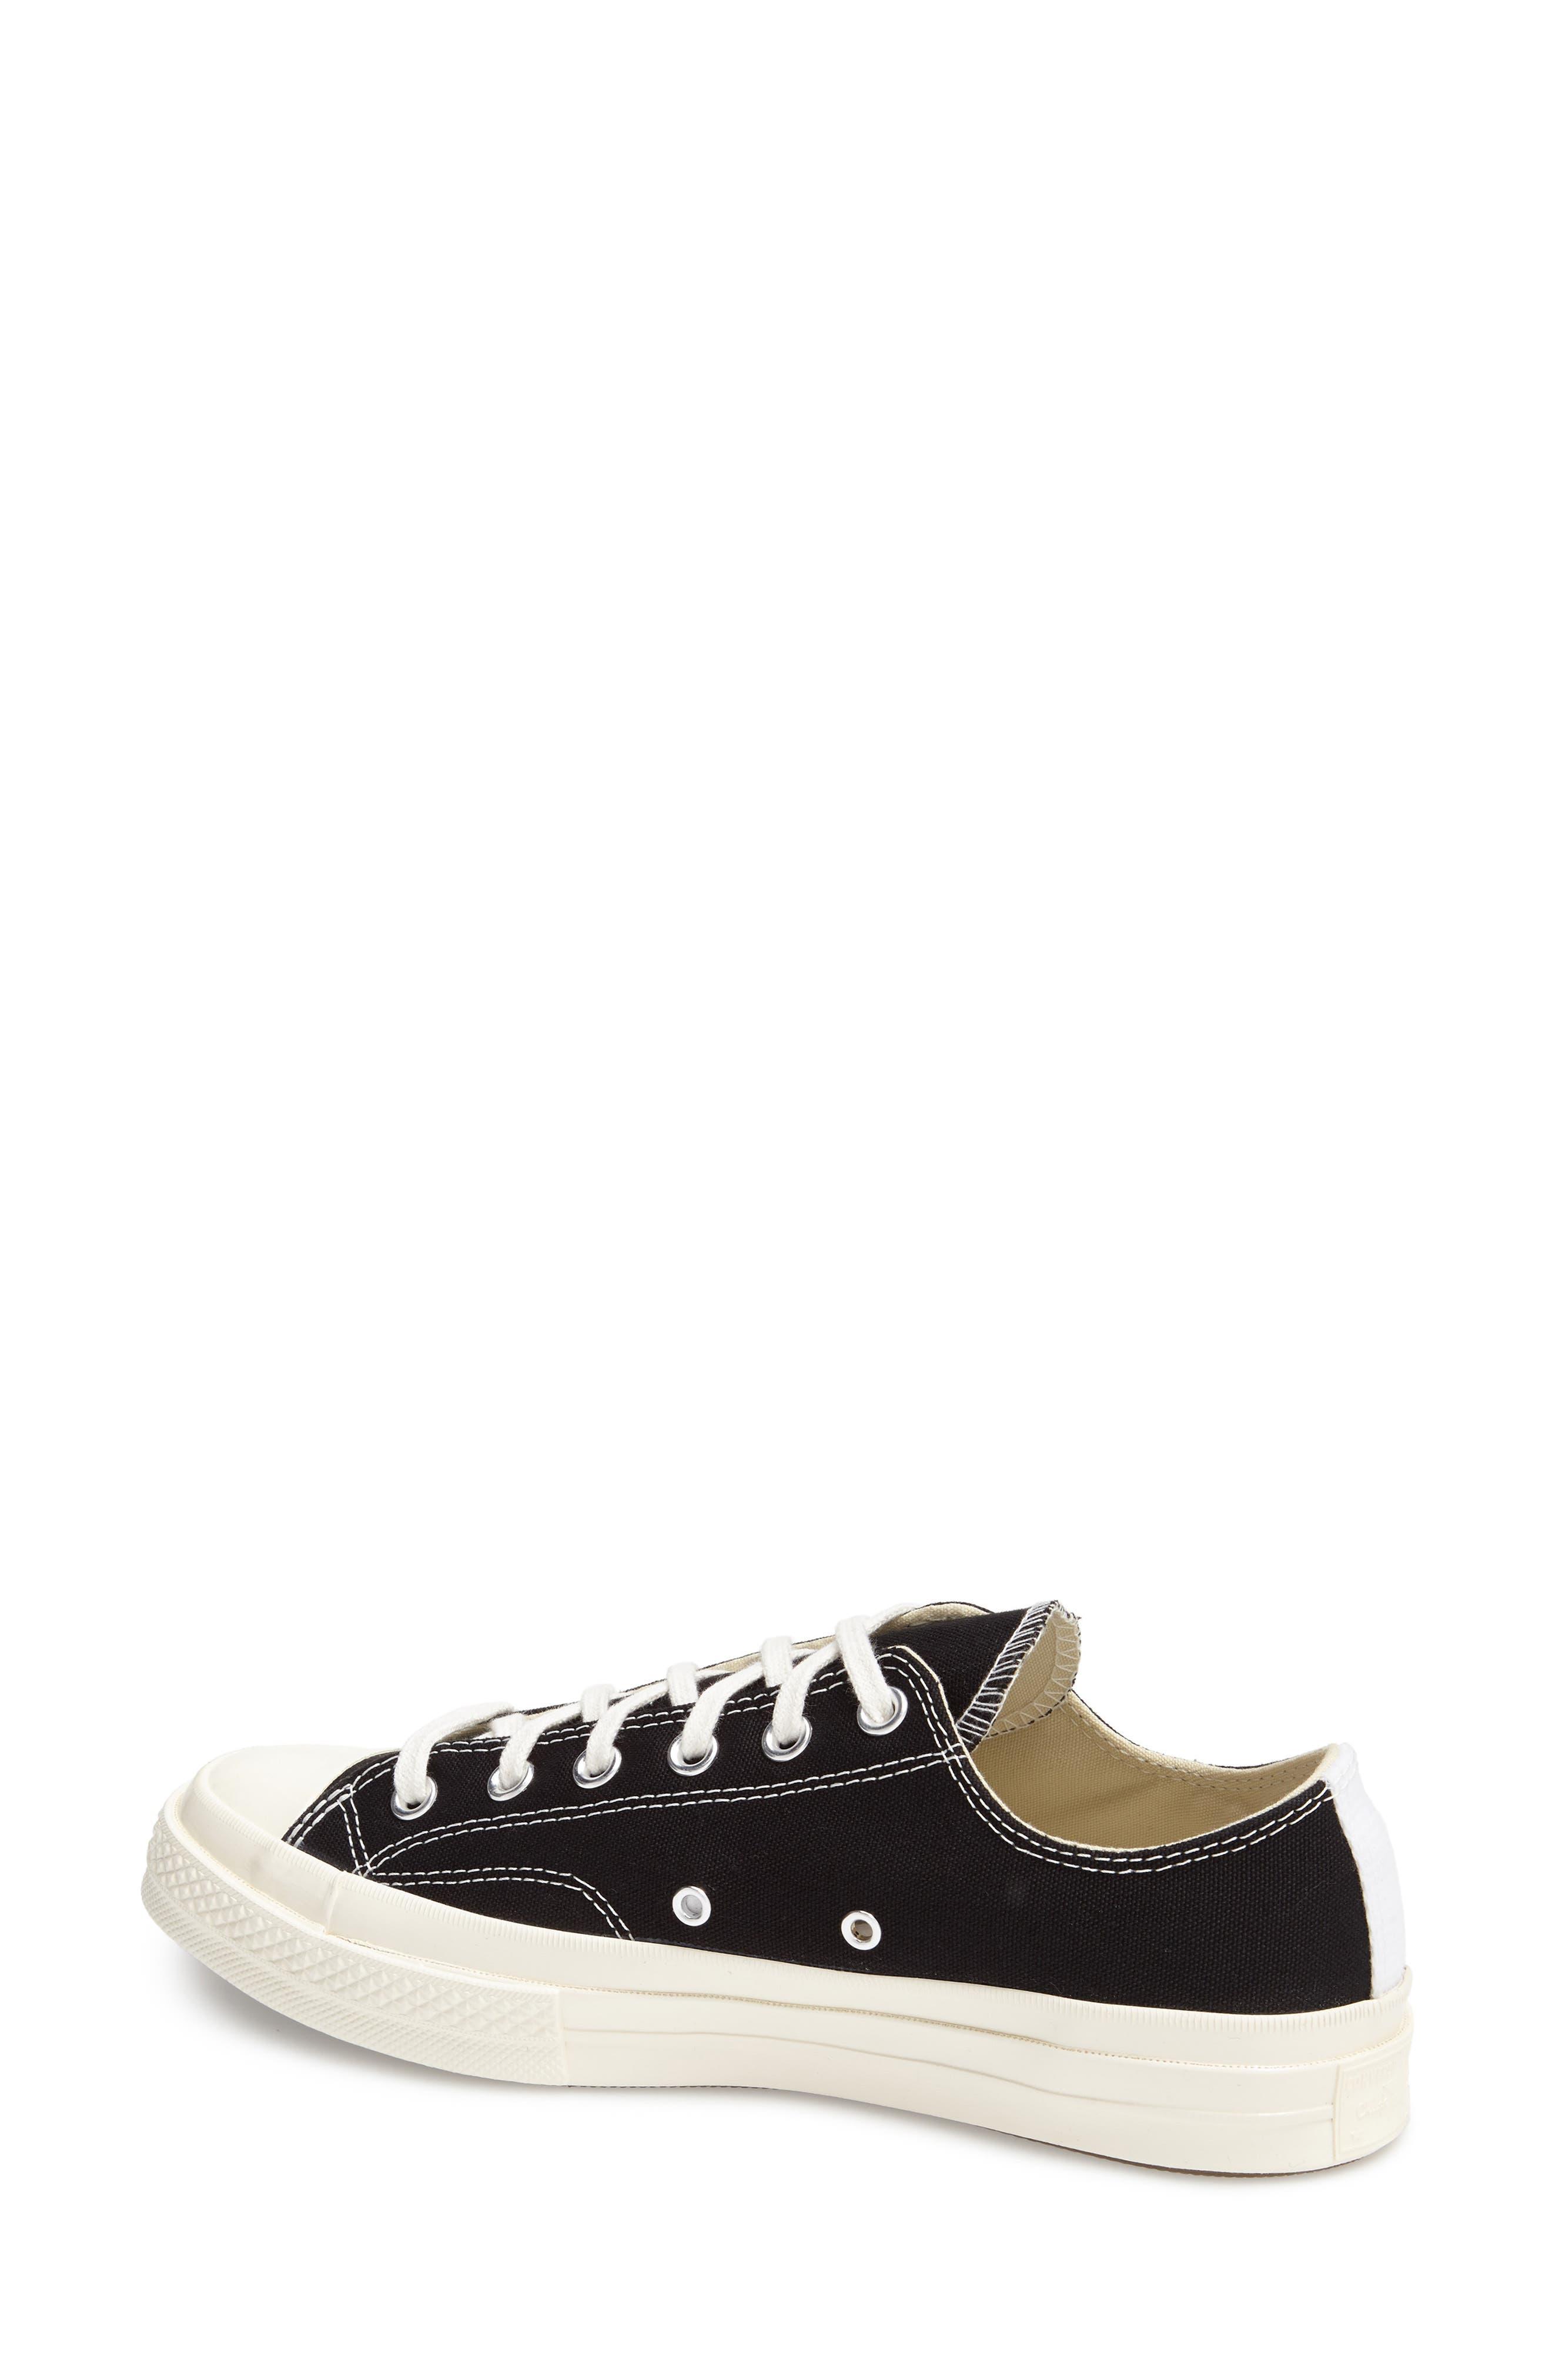 COMME DES GARÇONS PLAY x Converse Chuck Taylor<sup>®</sup> Hidden Heart Low Top Sneaker, Main, color, BLACK